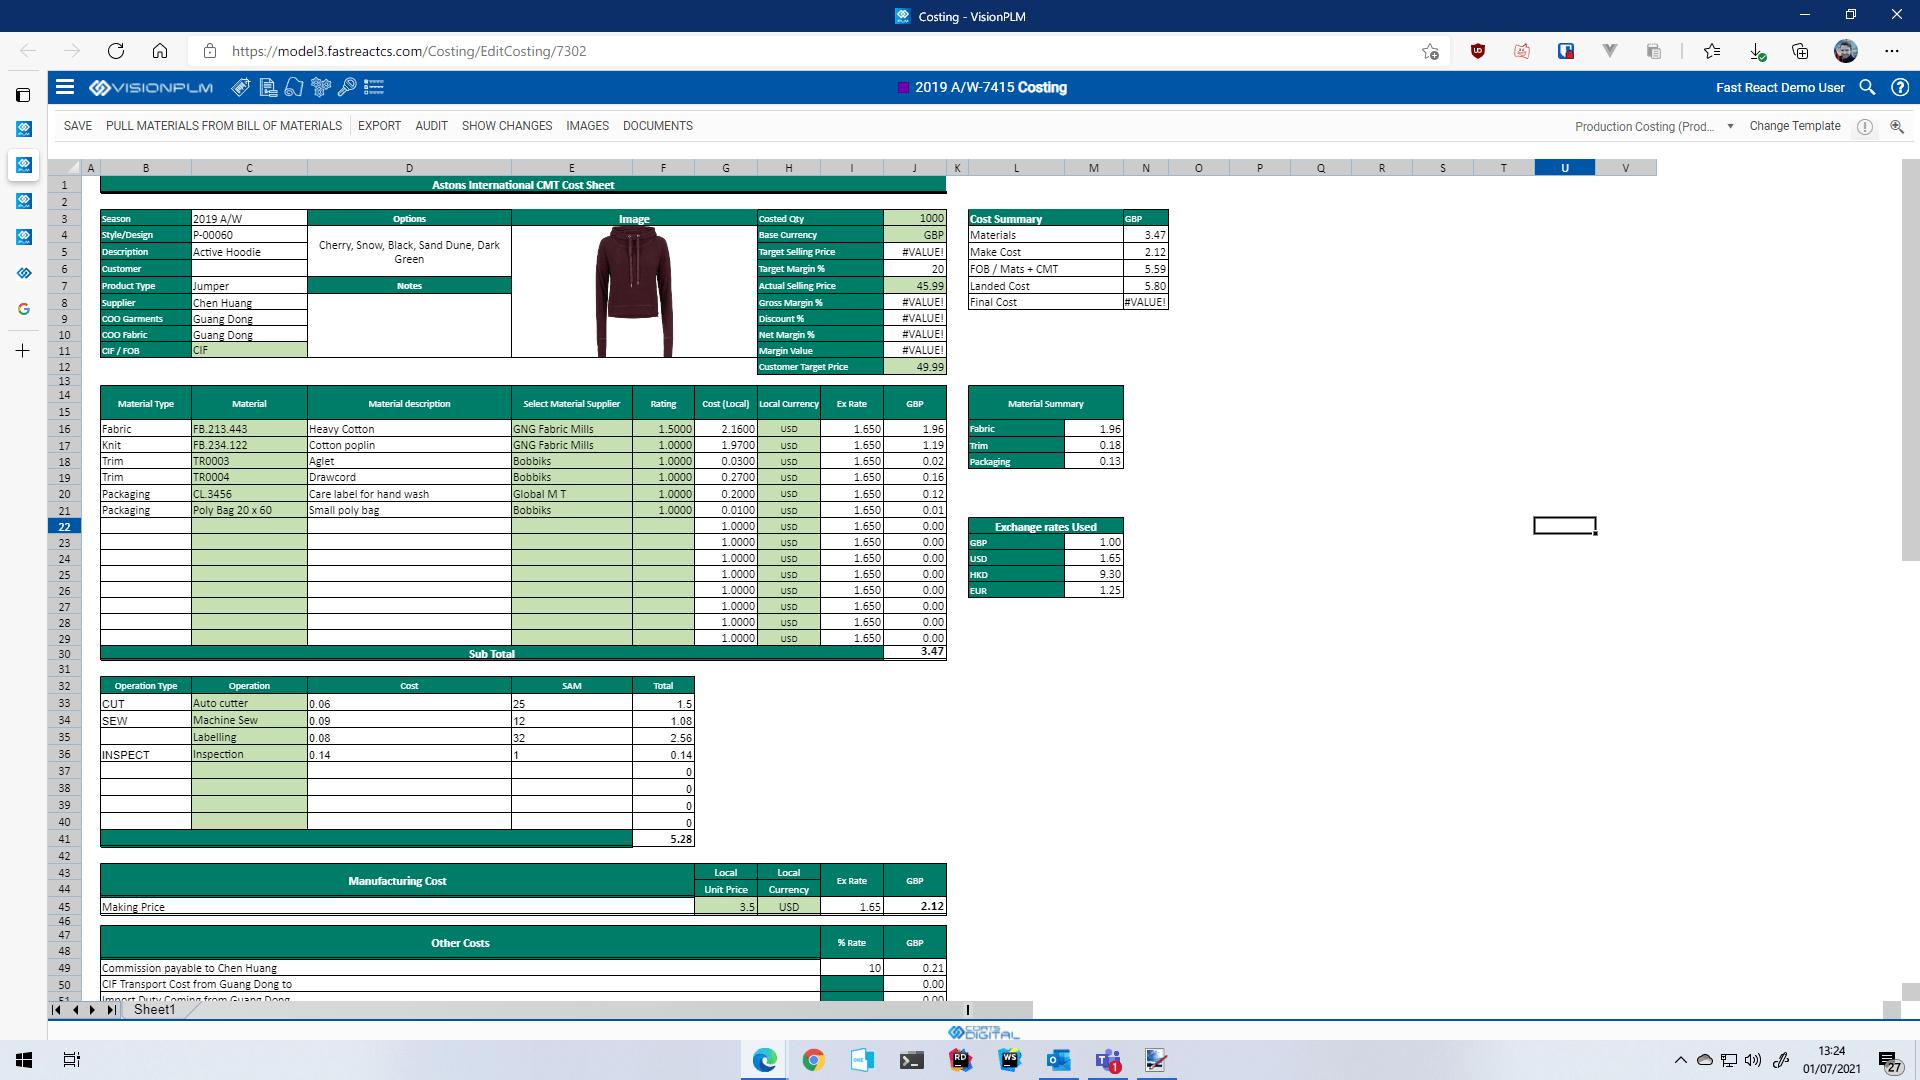 Screenshot of sourcing module in Coats Digital's VisionPLM solution